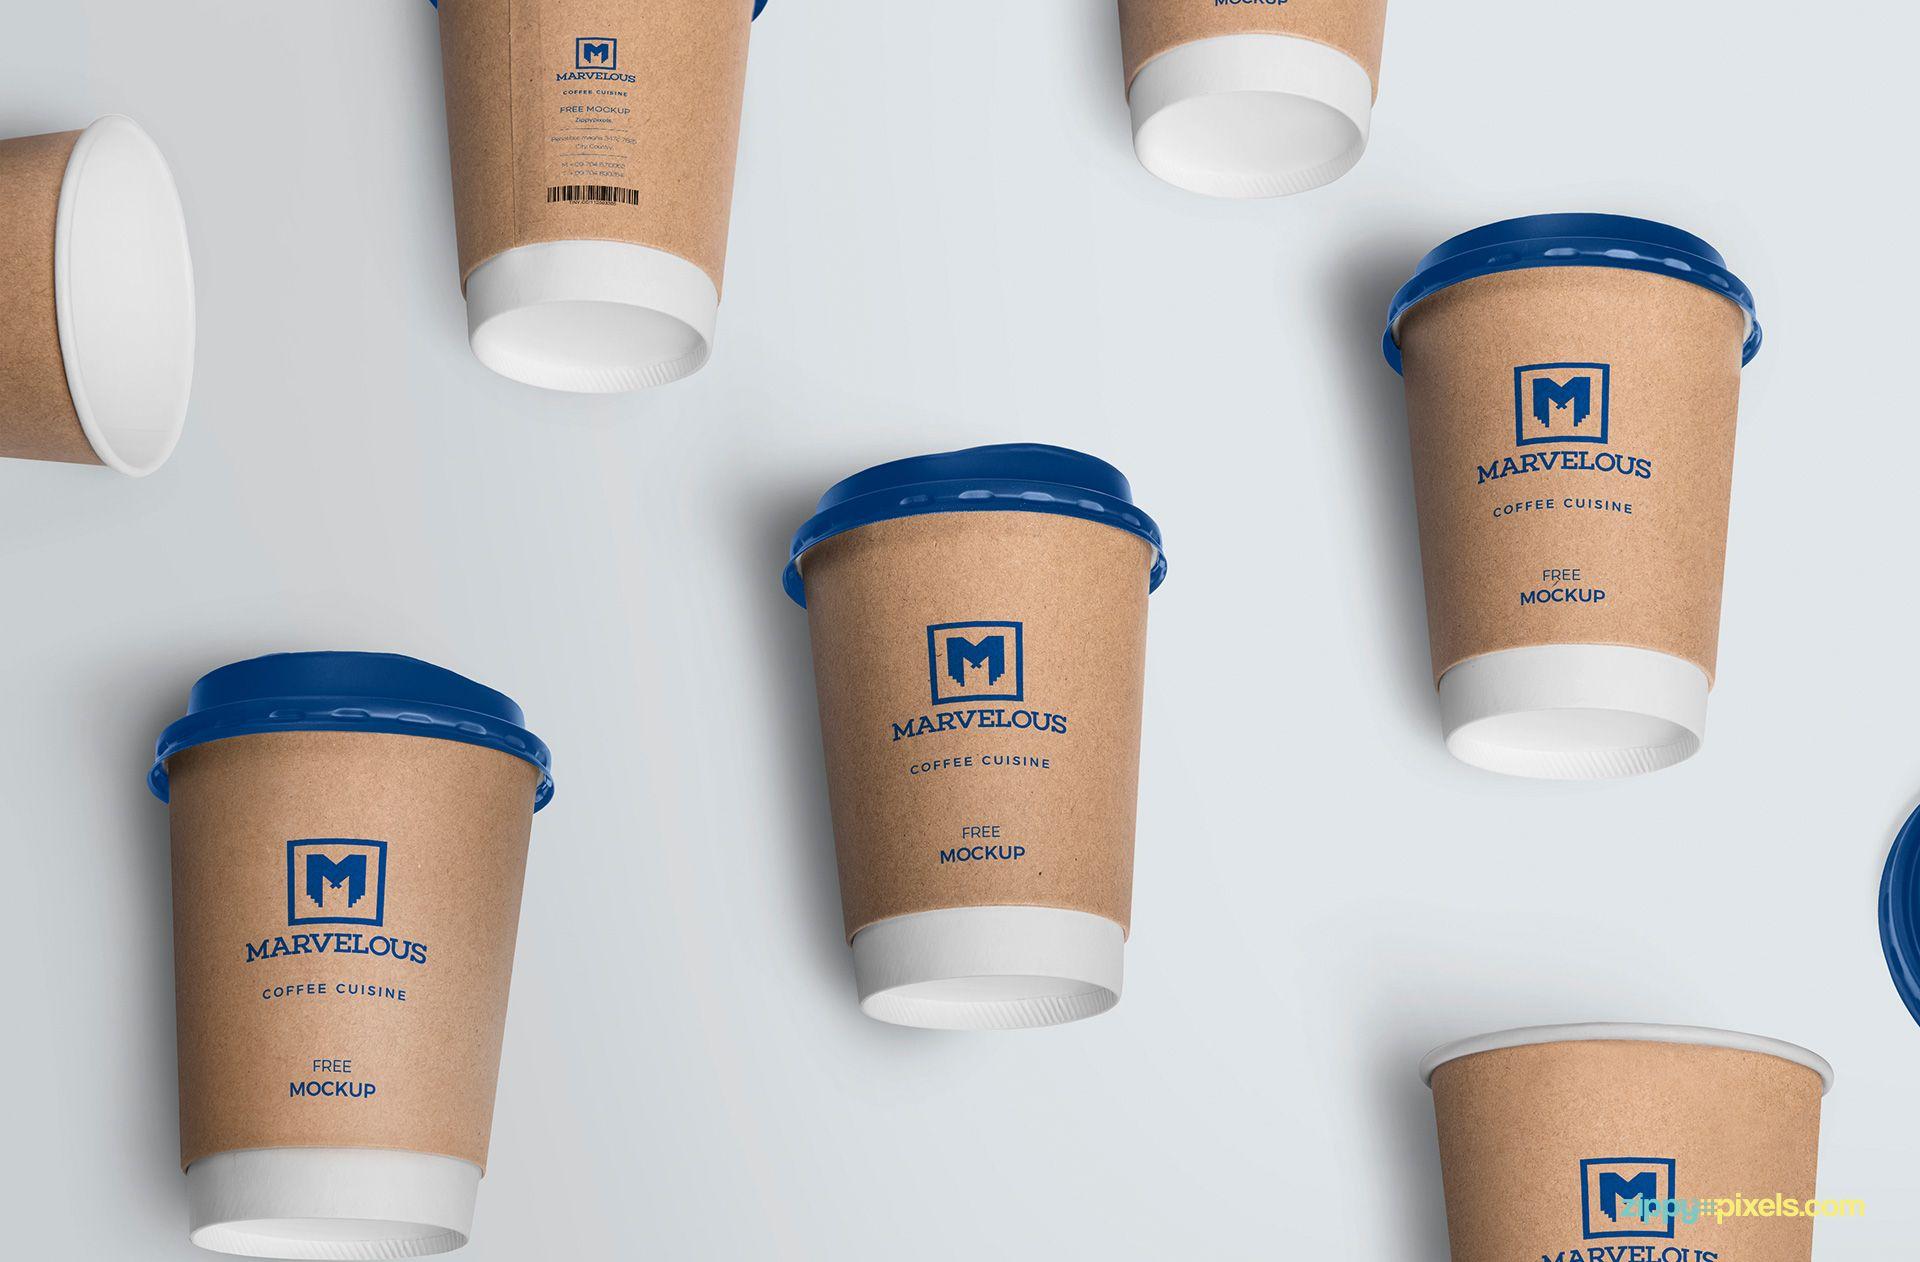 Coffee Cup Mockup Free PSD カップデザイン, ヴィンテージクラフト, コーヒーカップ